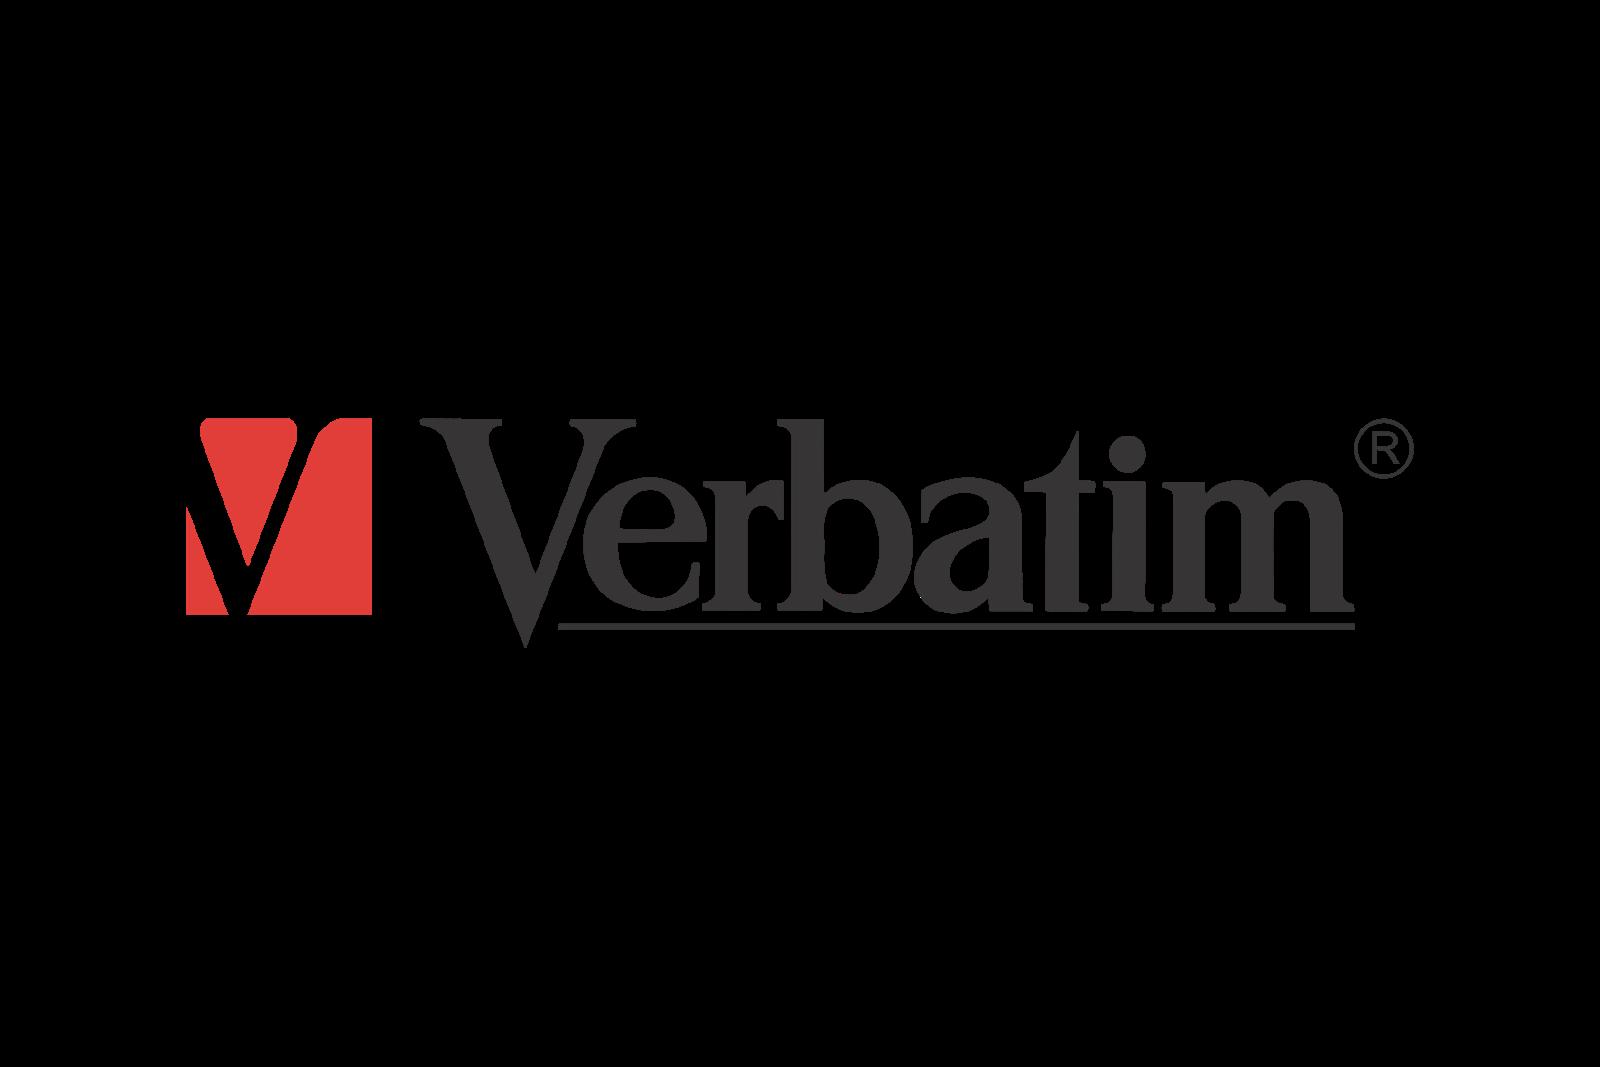 Znalezione obrazy dla zapytania verbatim logo